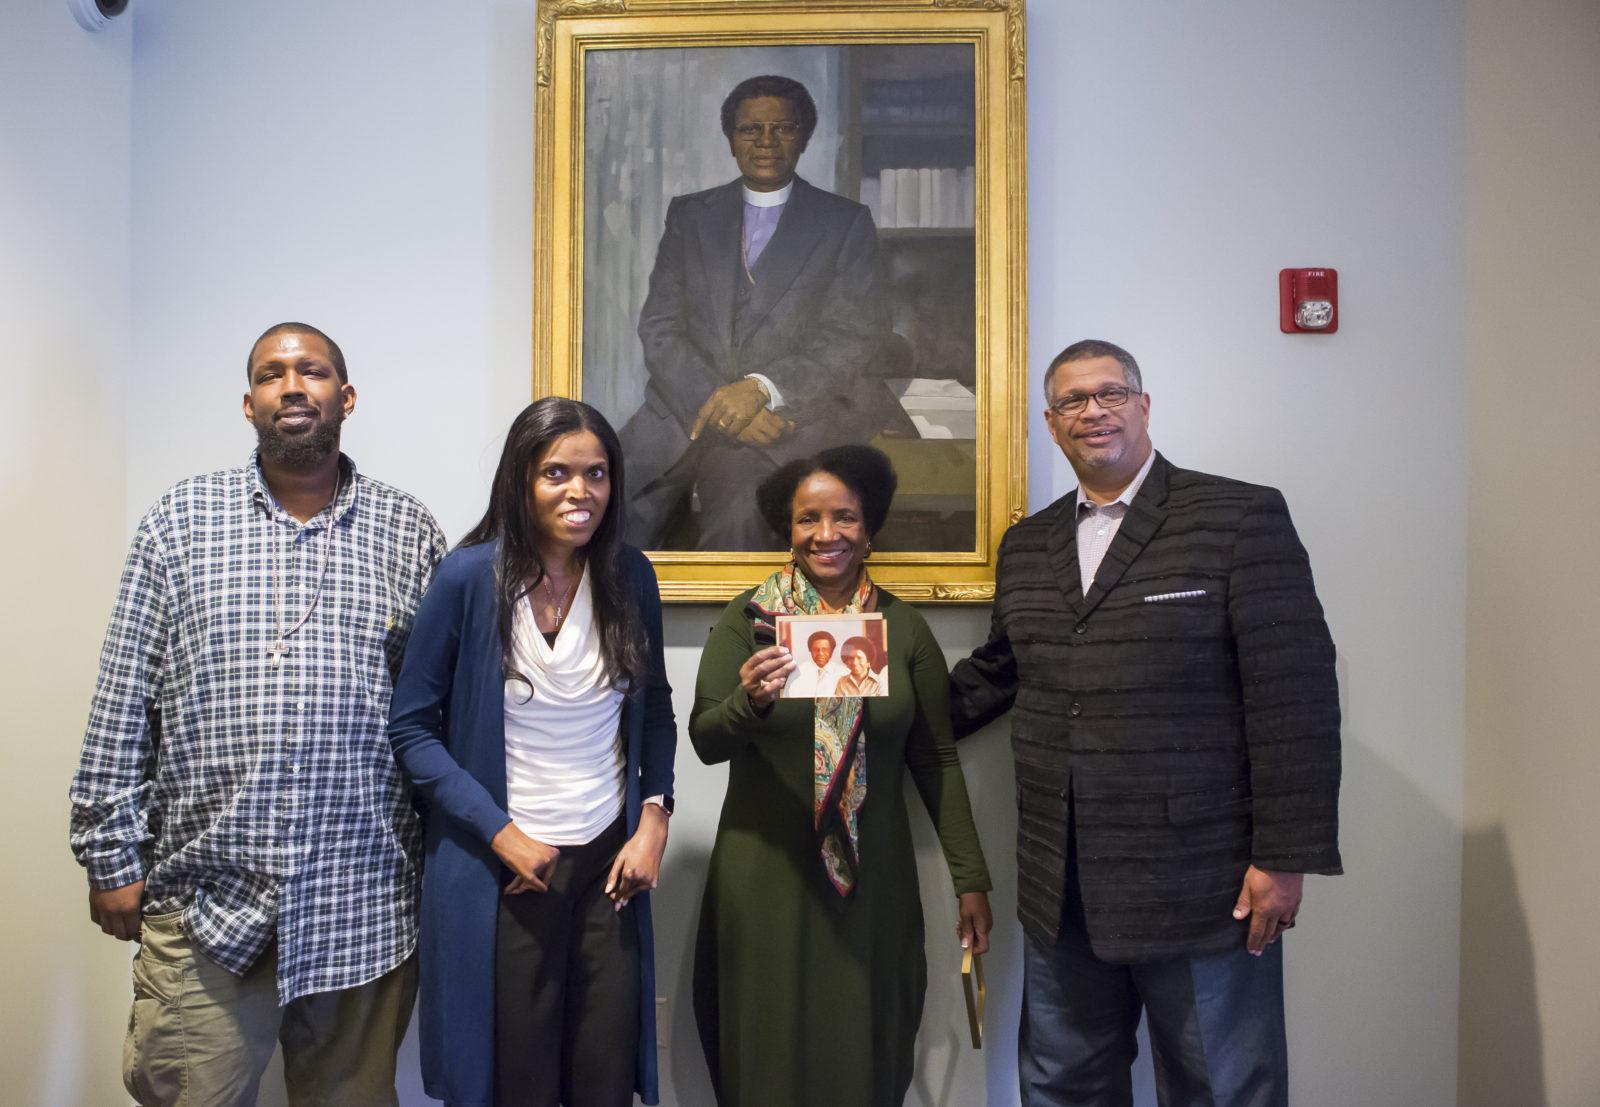 Family of Bishop Joseph Johnson at the Vanderbilt Trailblazer portrait unveiling on Oct. 18. (Susan Urmy/Vanderbilt)